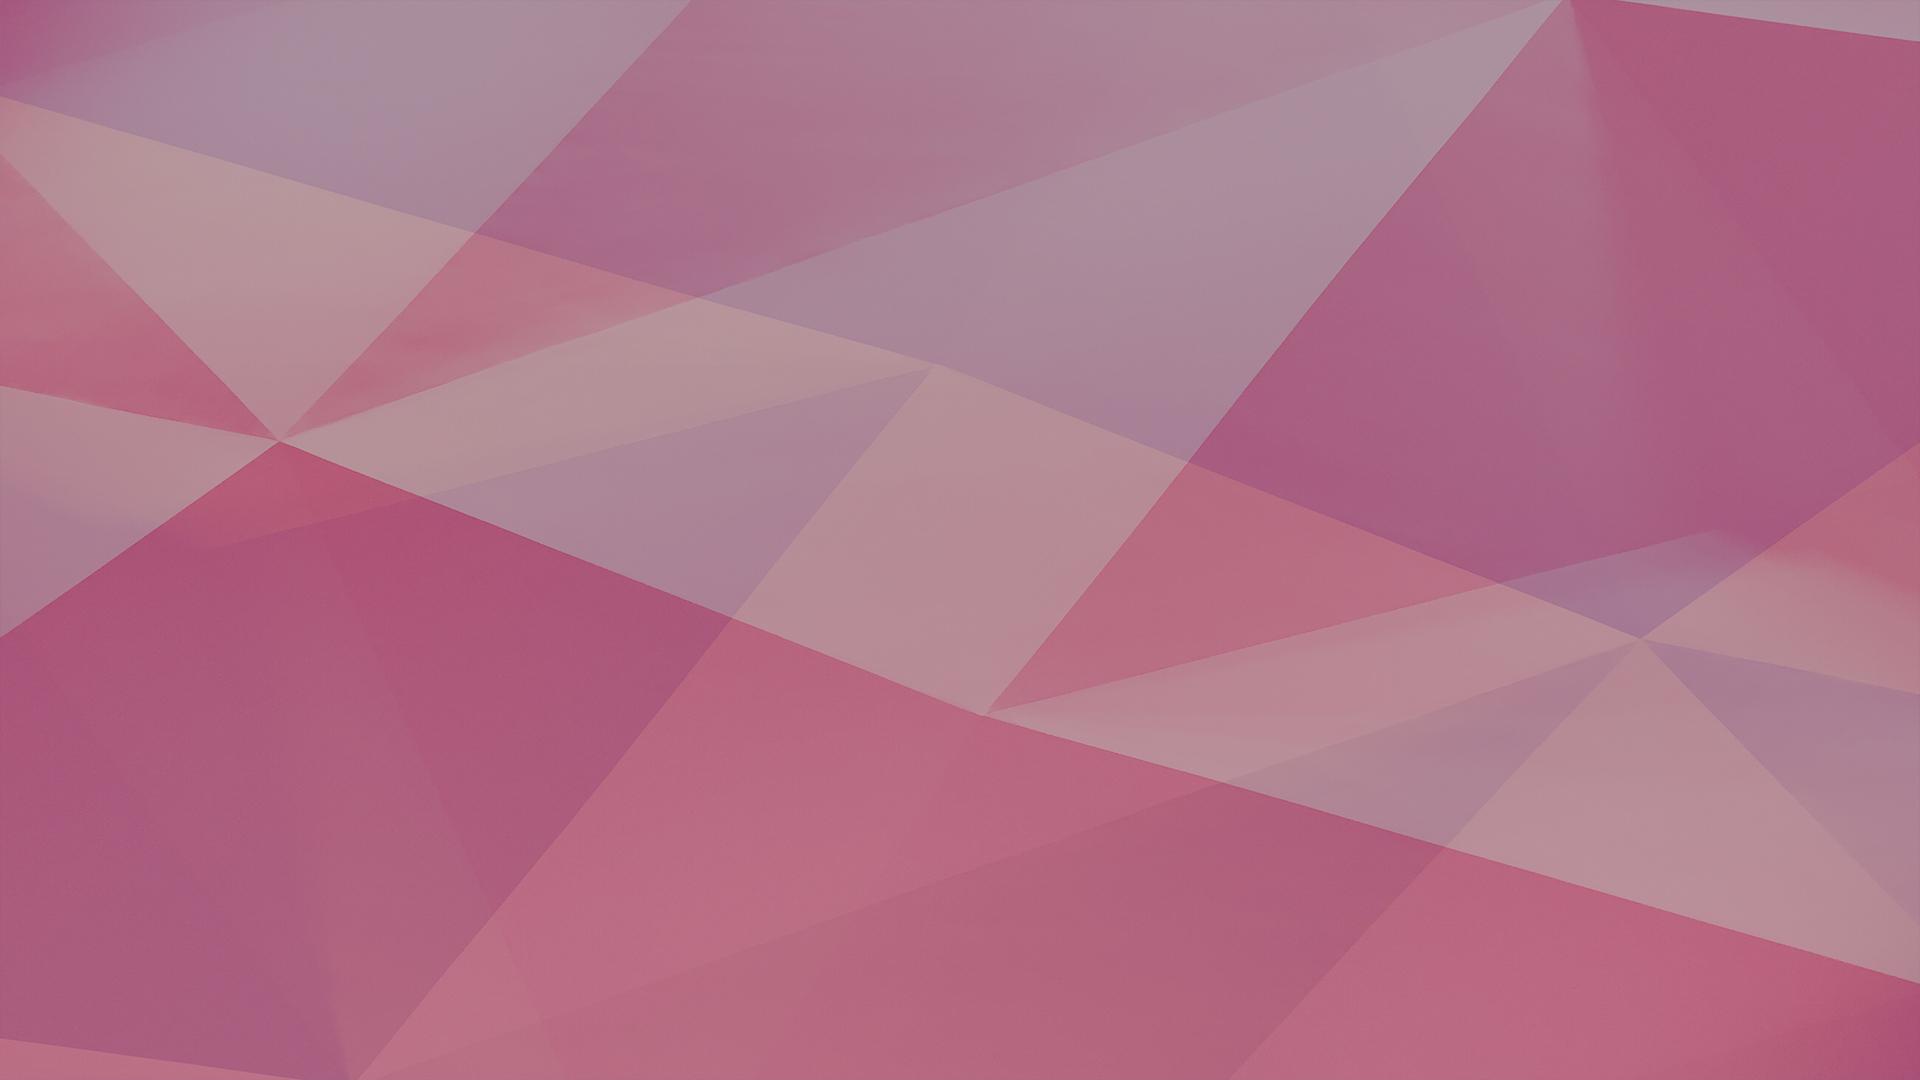 Bg-purple-light